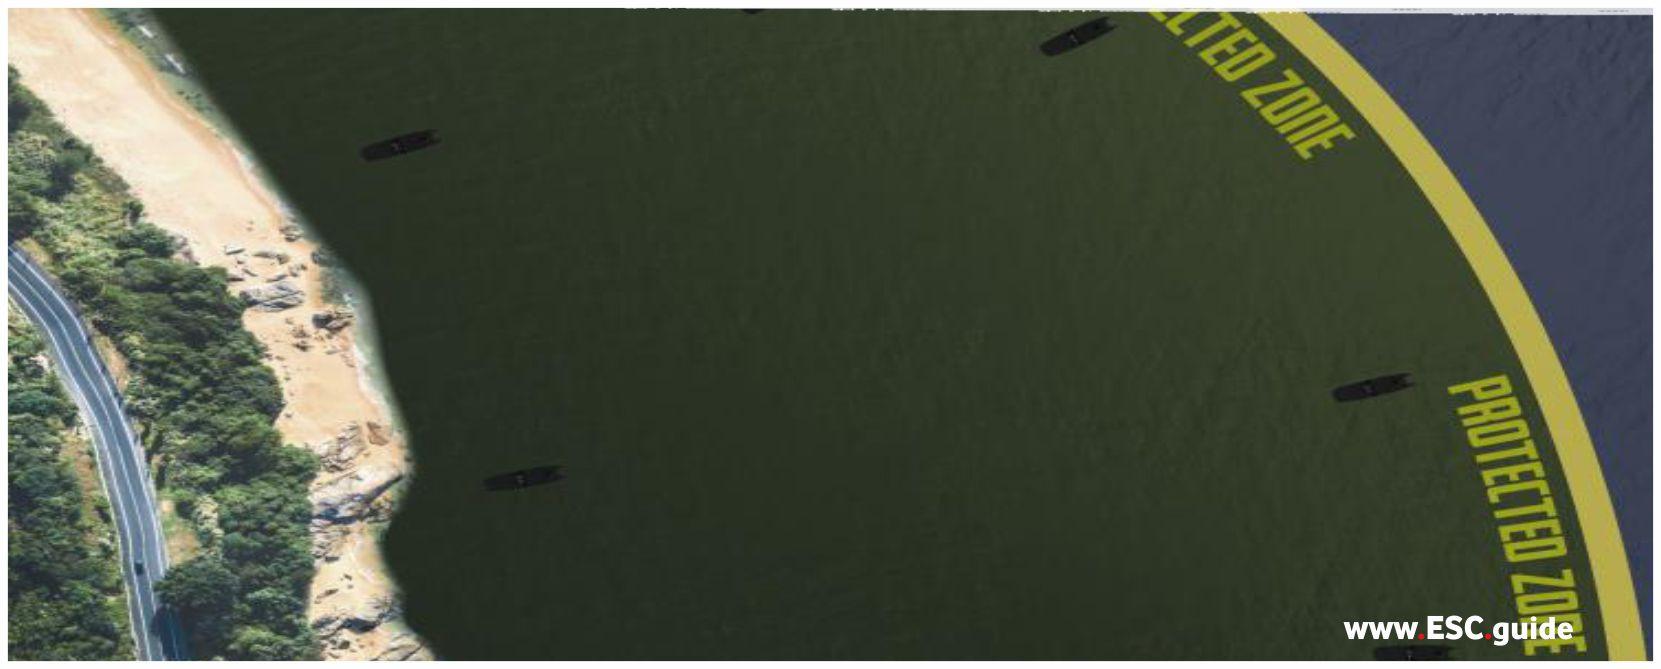 MANTAS T38 swarm is strategically placed around key islands.